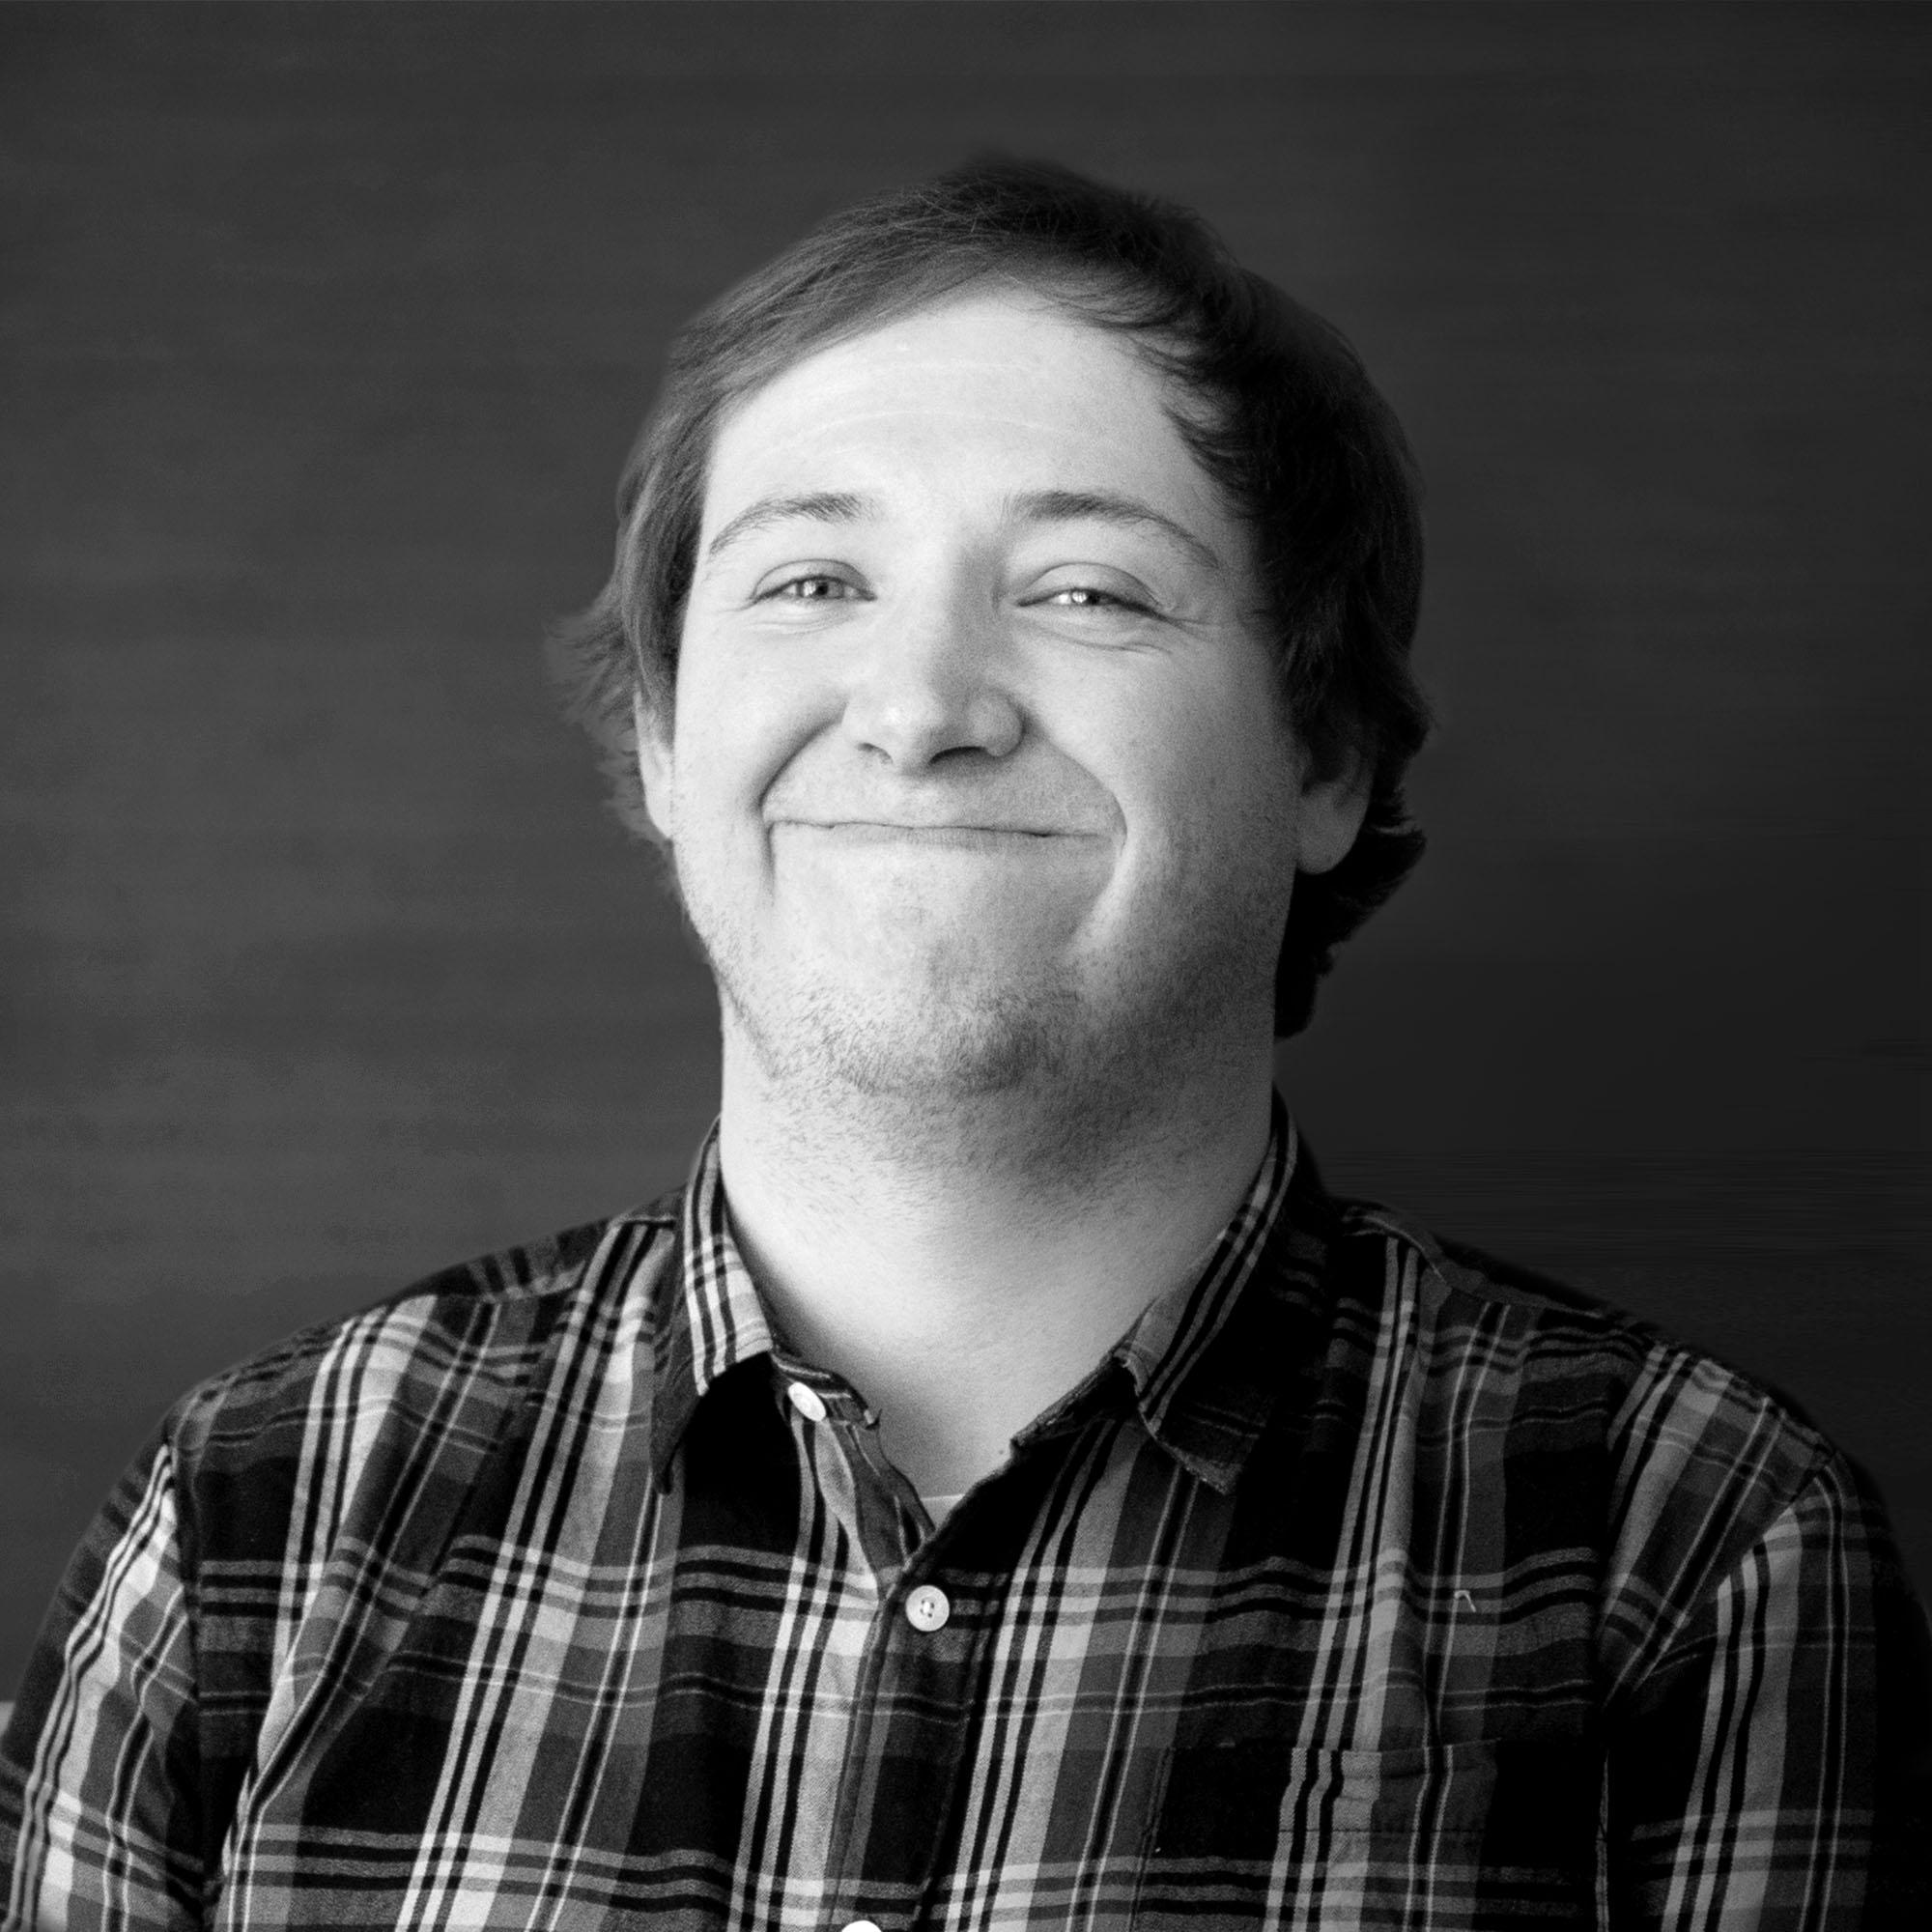 Connor Christiansen - Copywriter